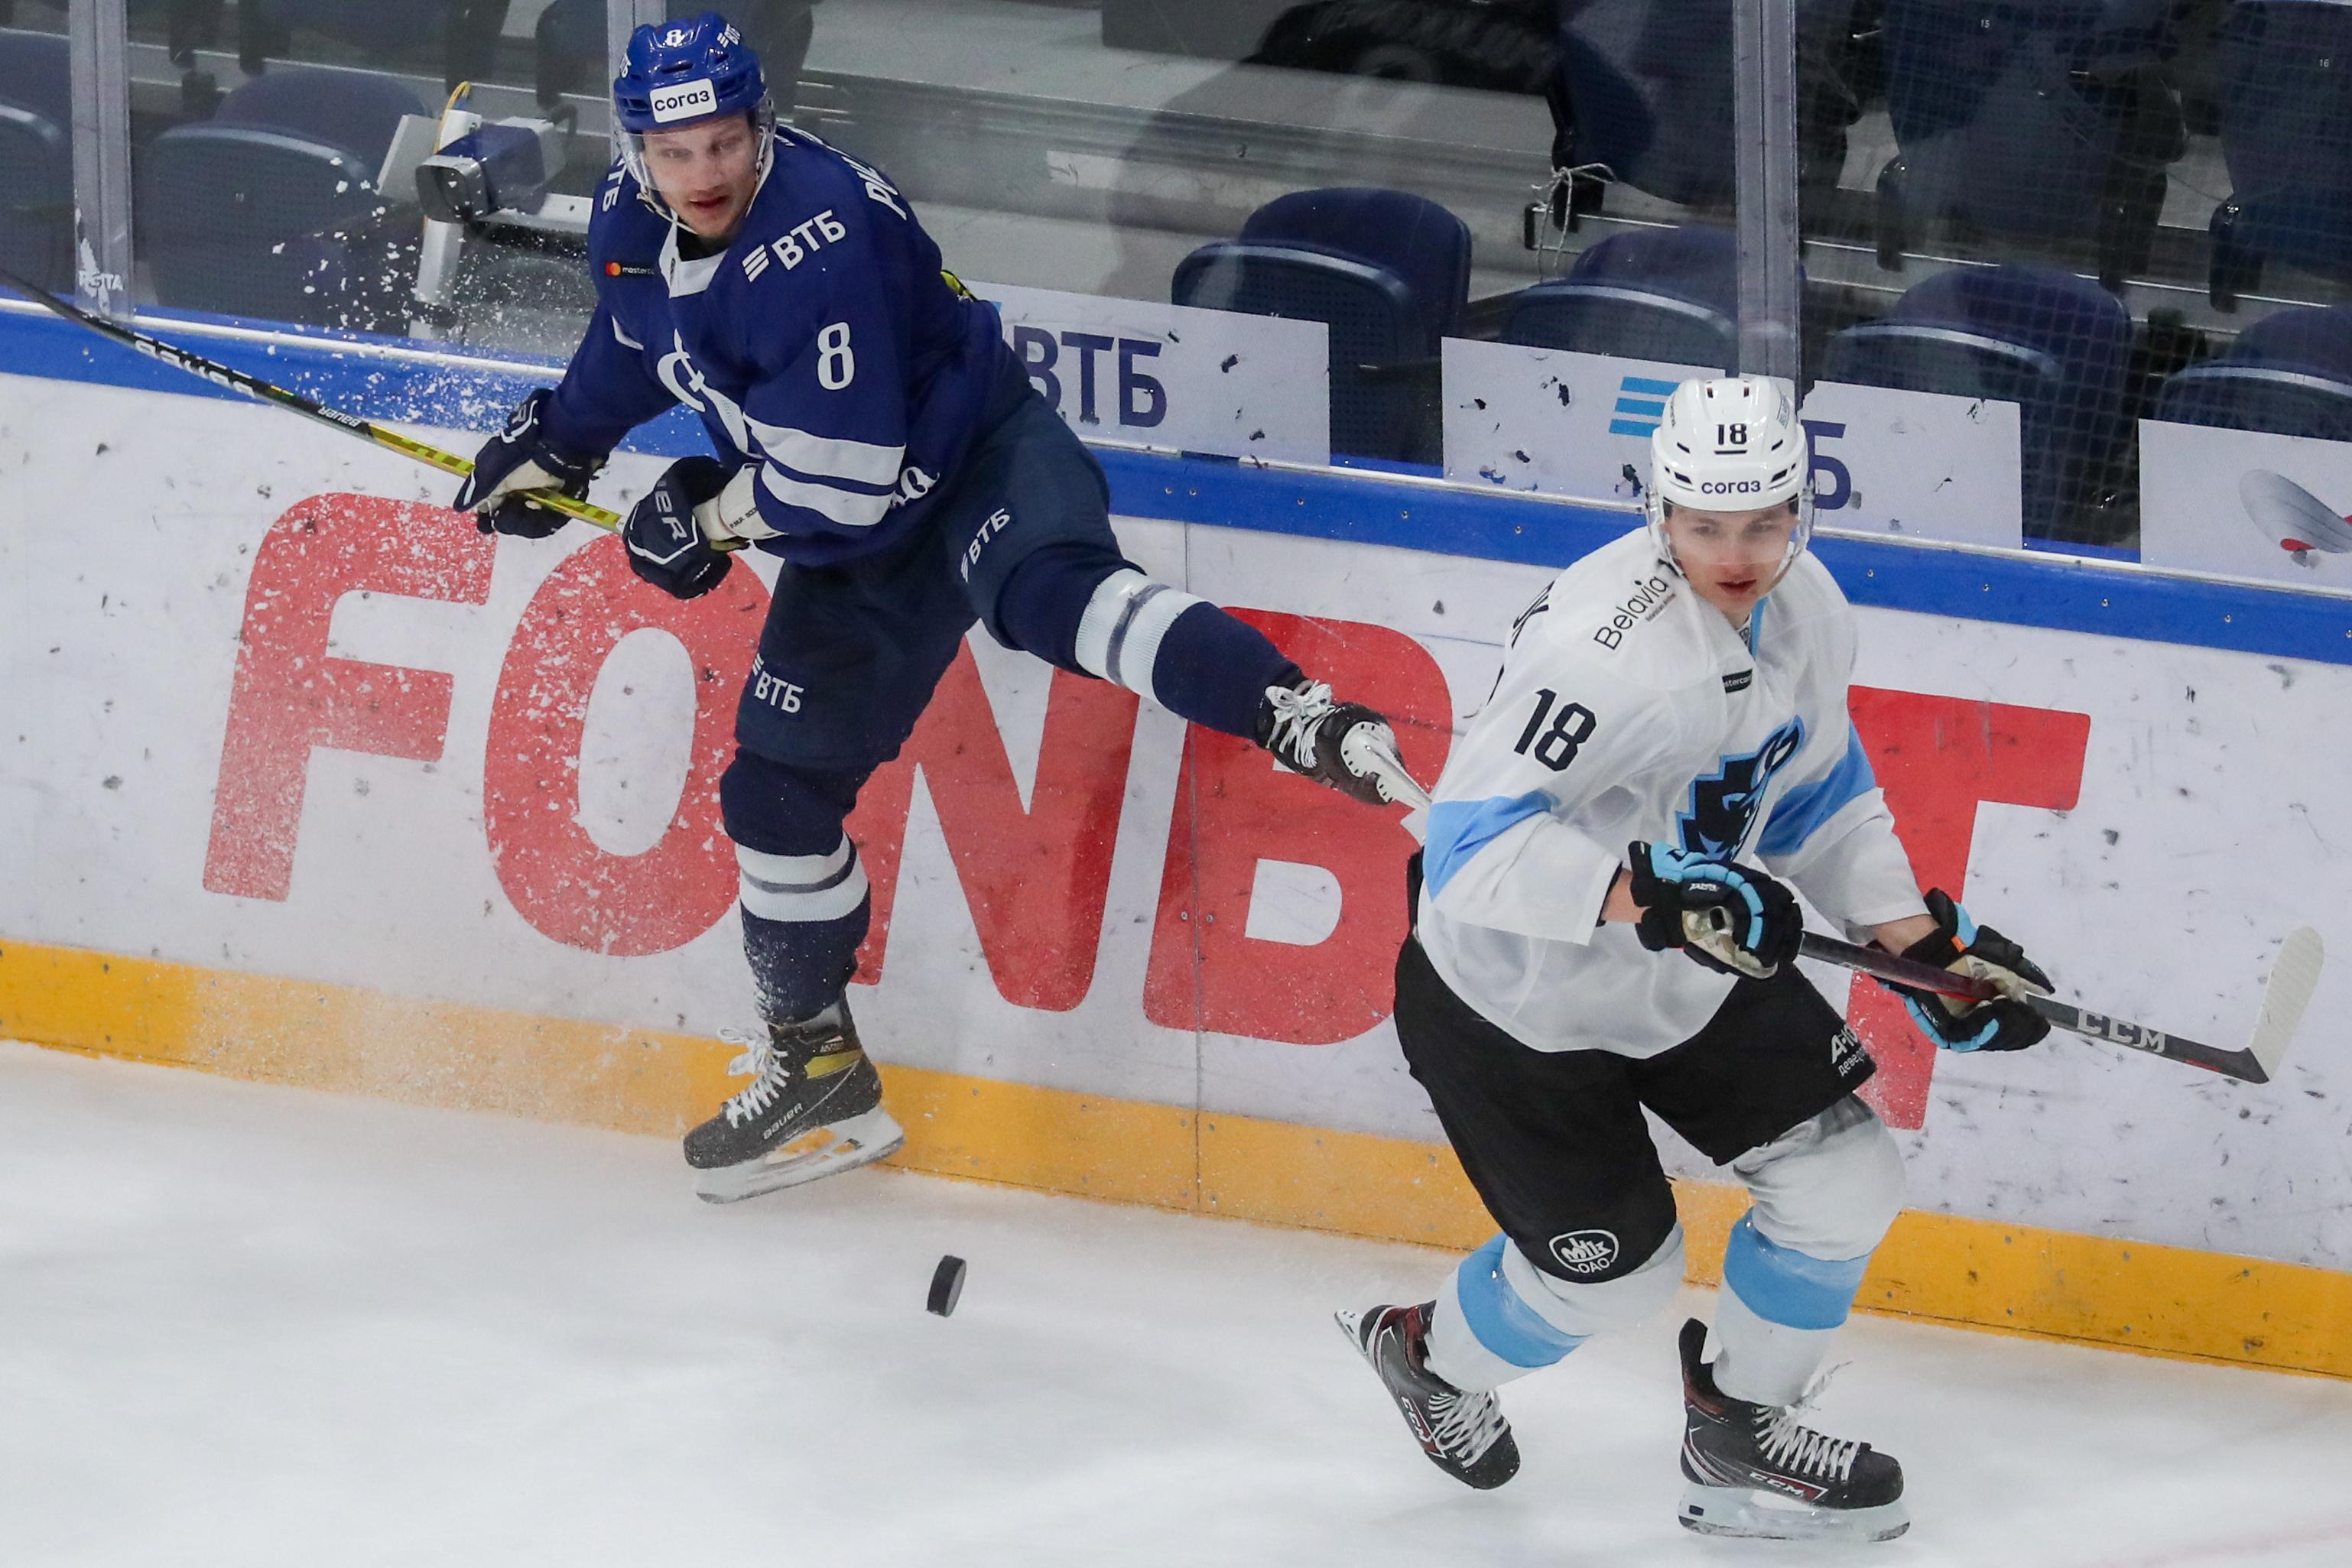 2020/2021 Kontinental Hockey League: Dynamo Moscow vs Dinamo Minsk